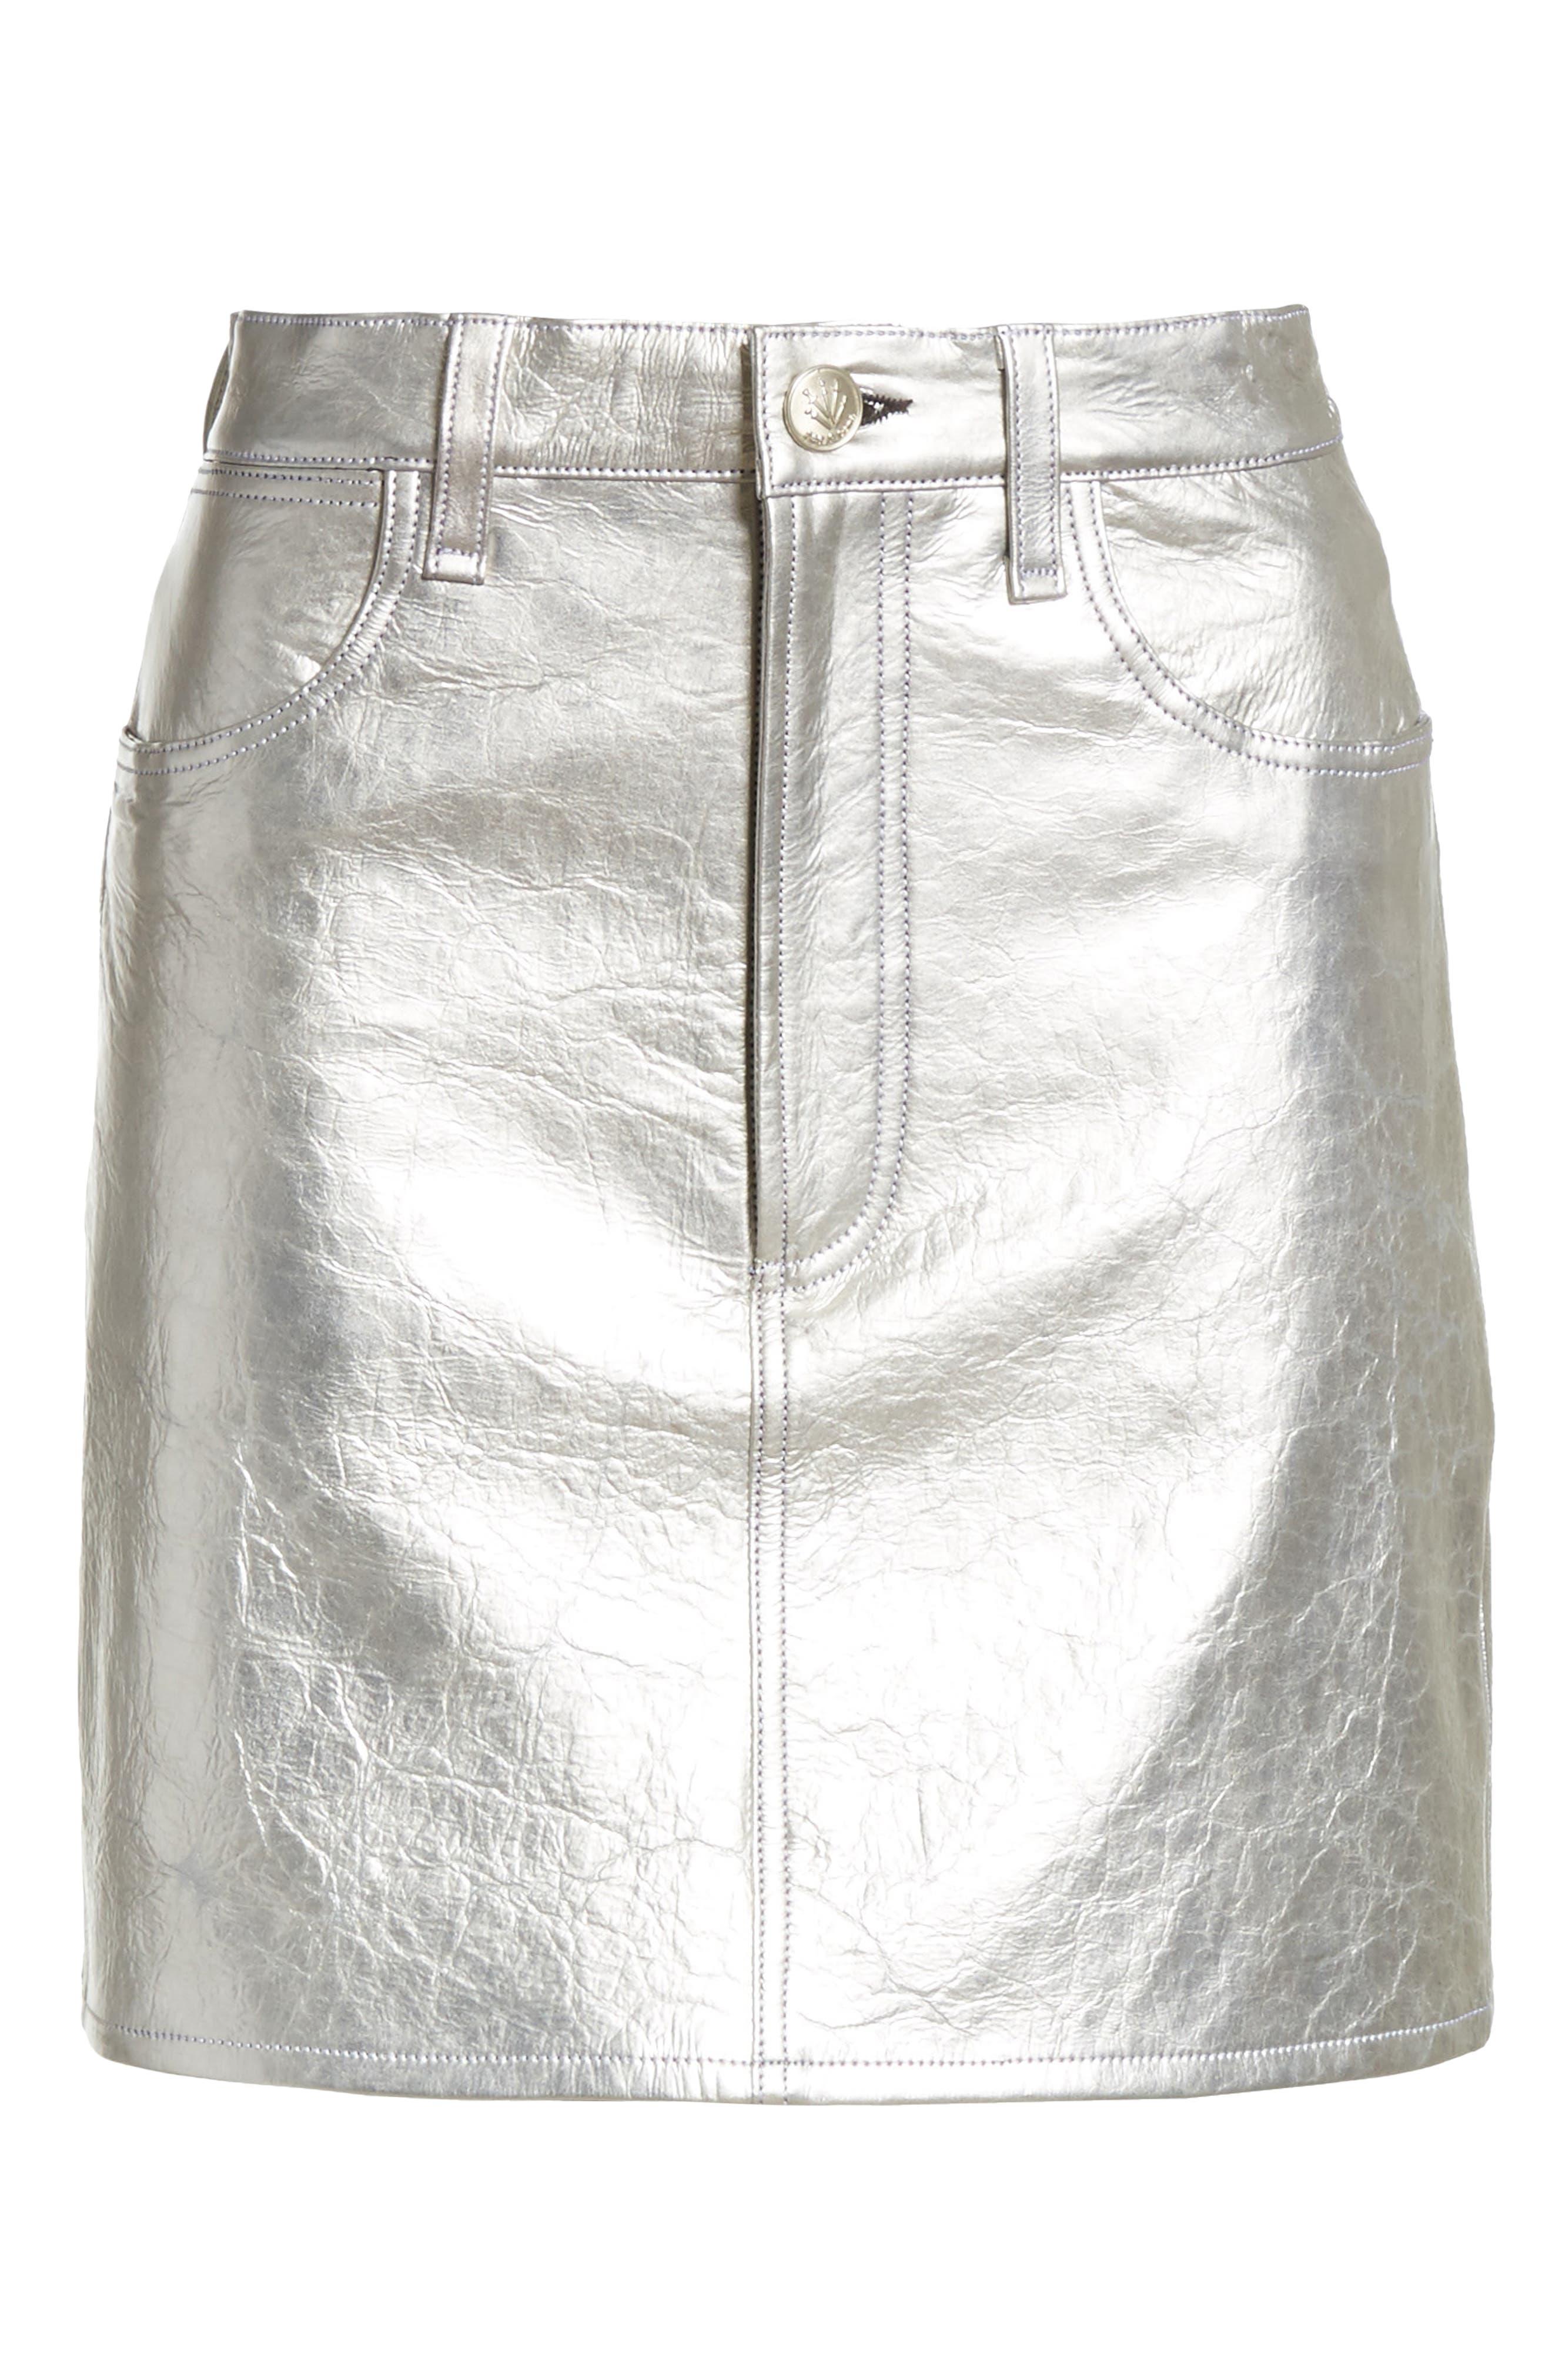 Moss High Waist Leather Miniskirt,                             Alternate thumbnail 6, color,                             041